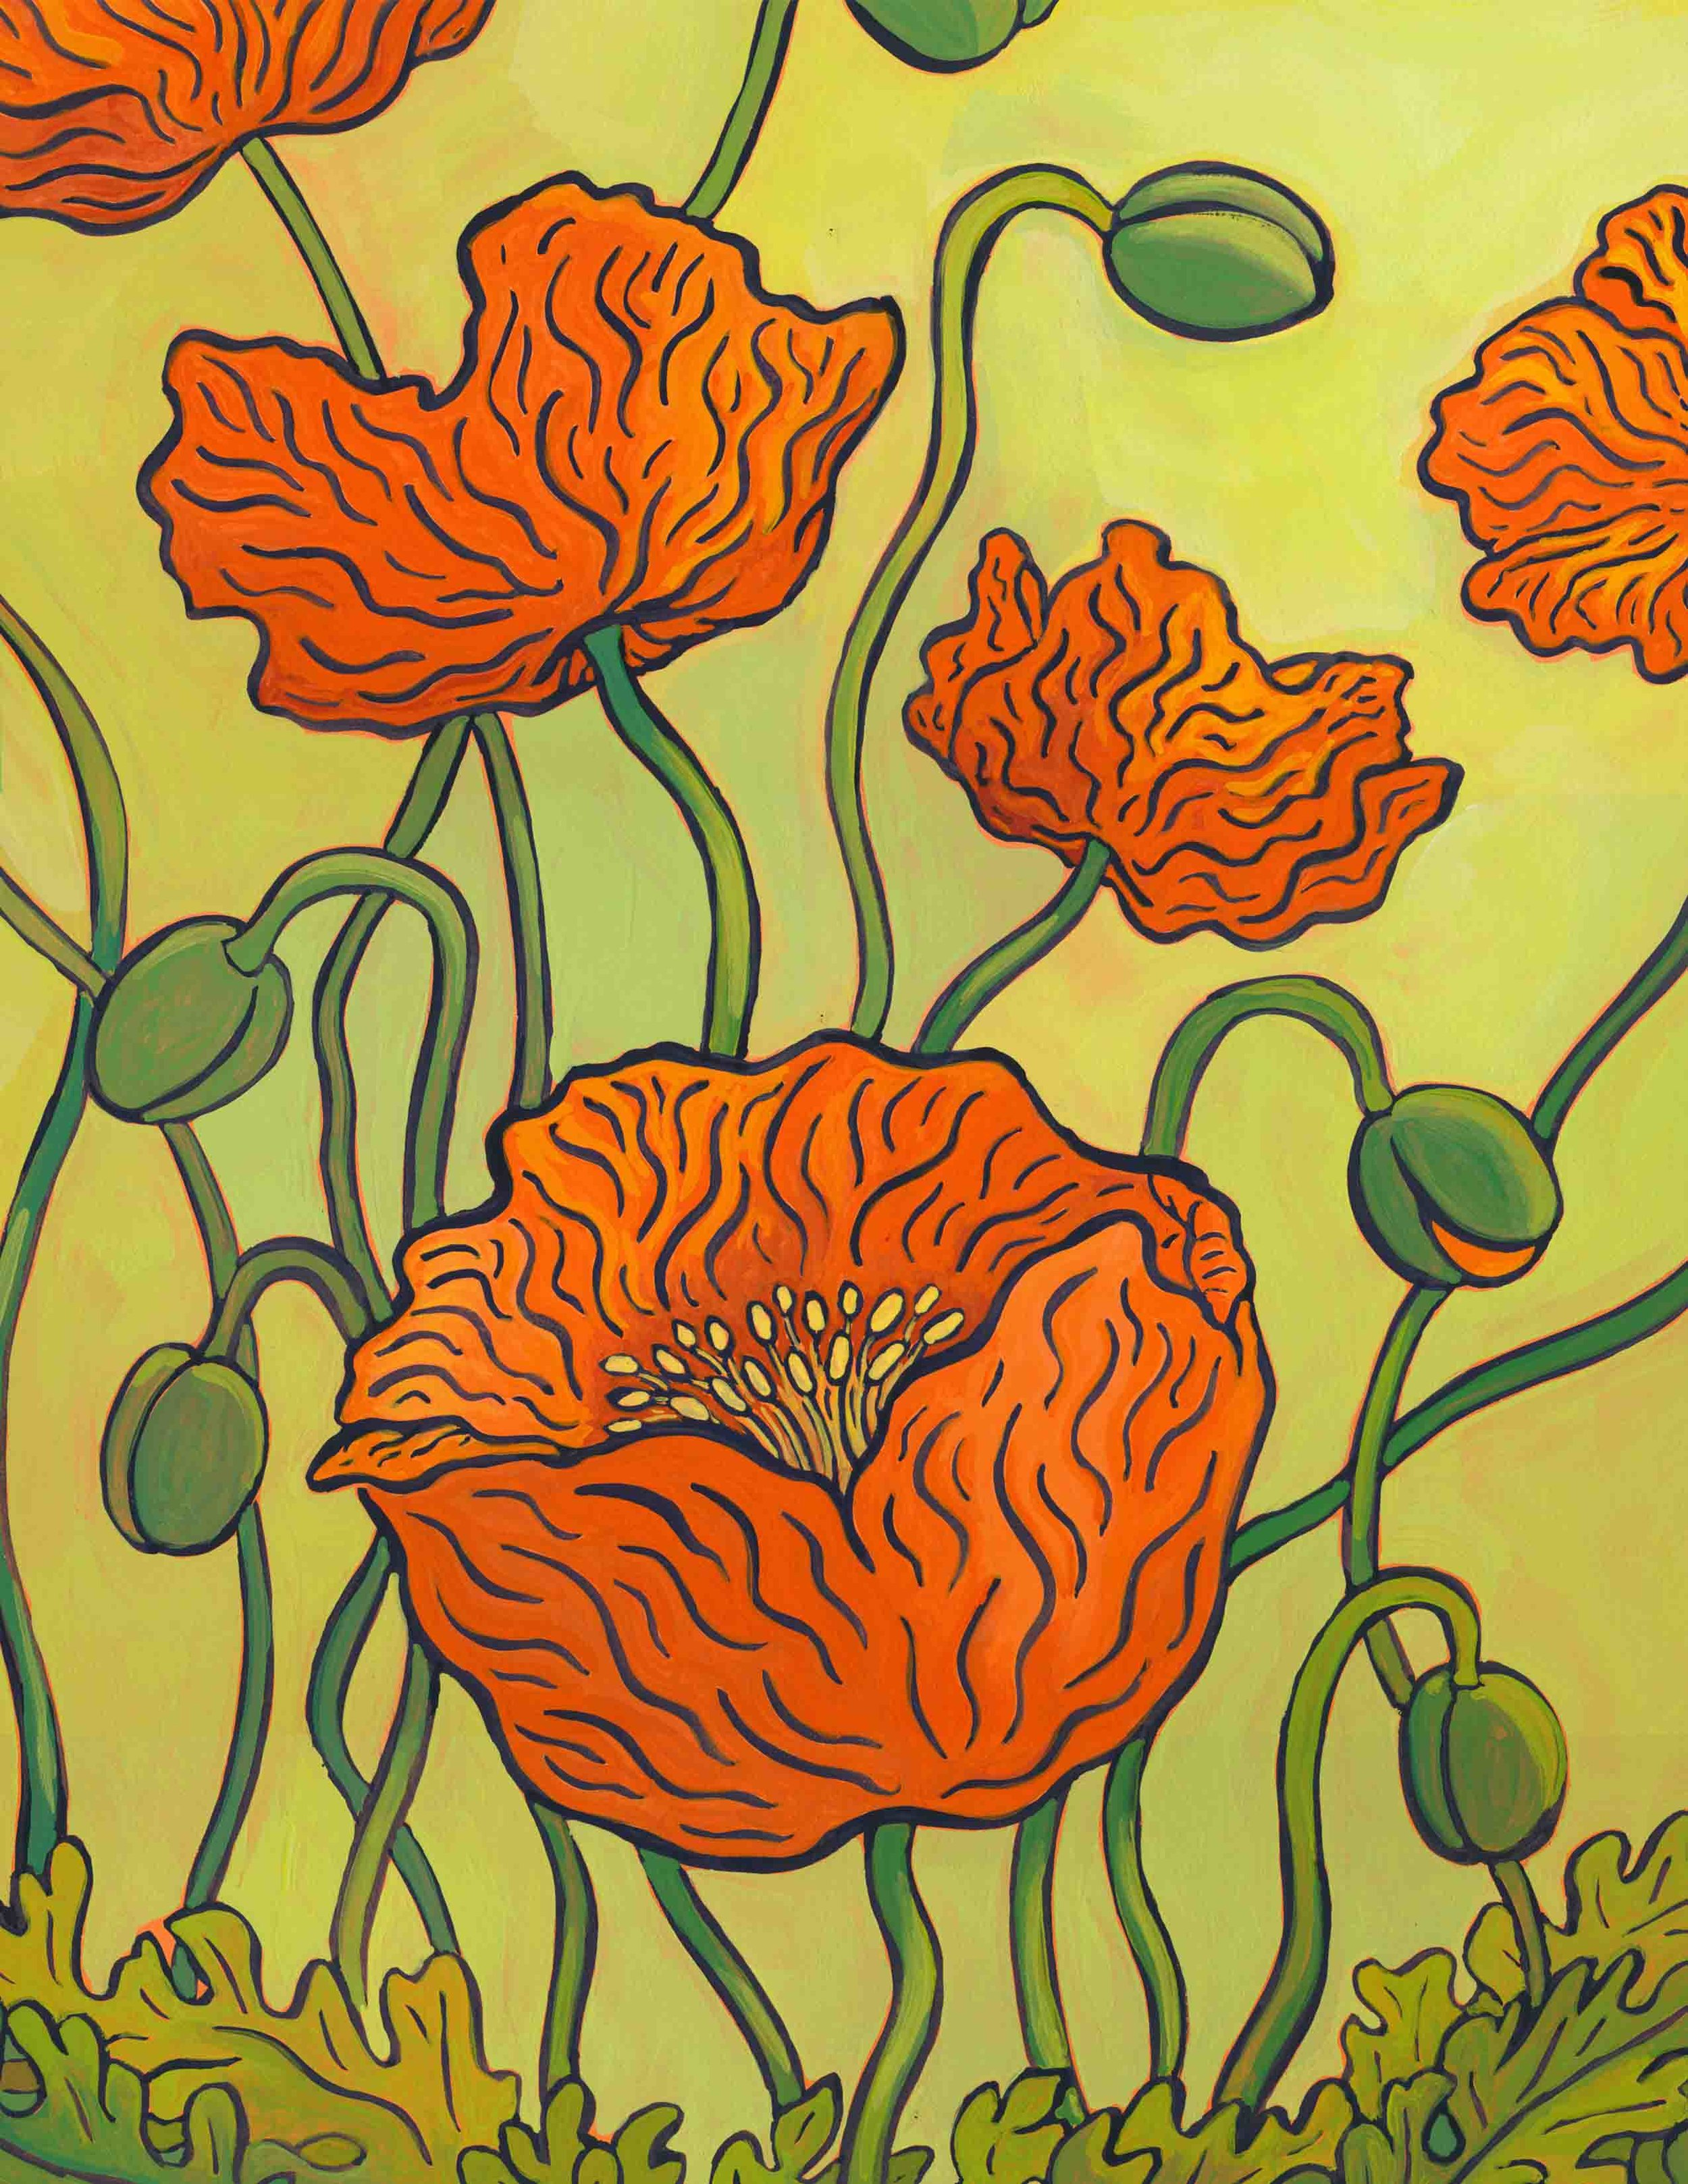 orange iceland poppies 2.jpg